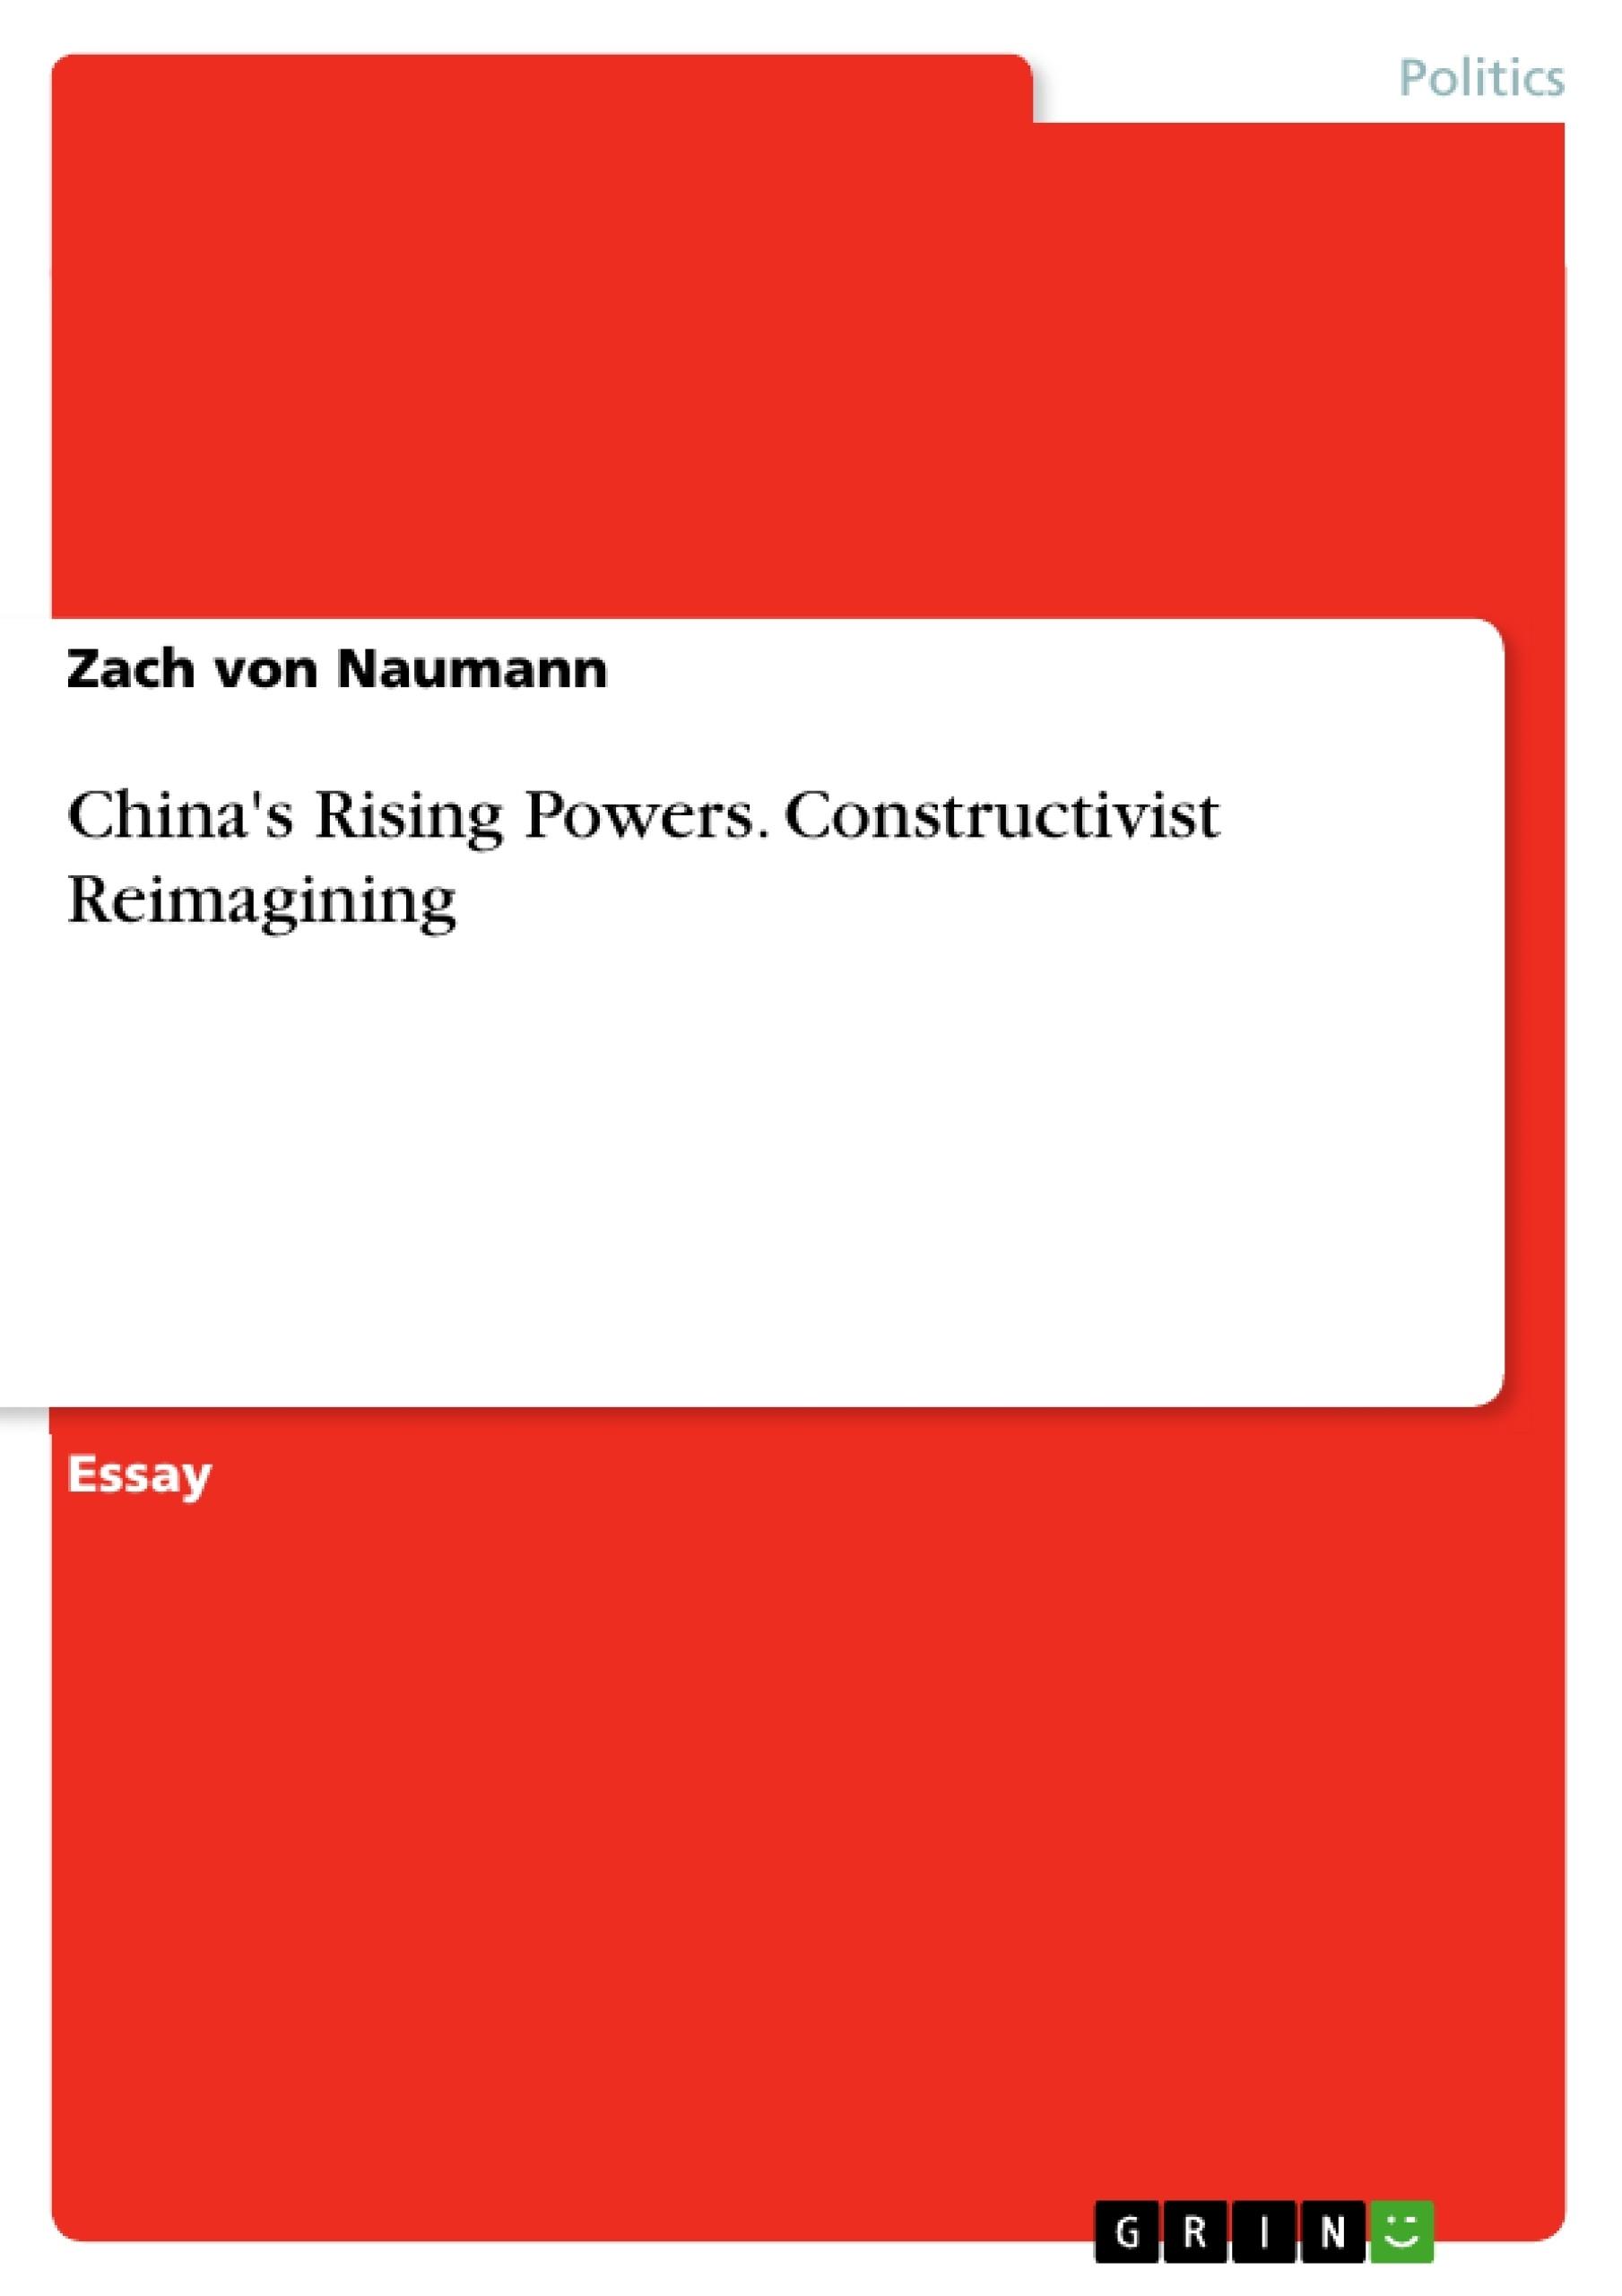 Title: China's Rising Powers. Constructivist Reimagining